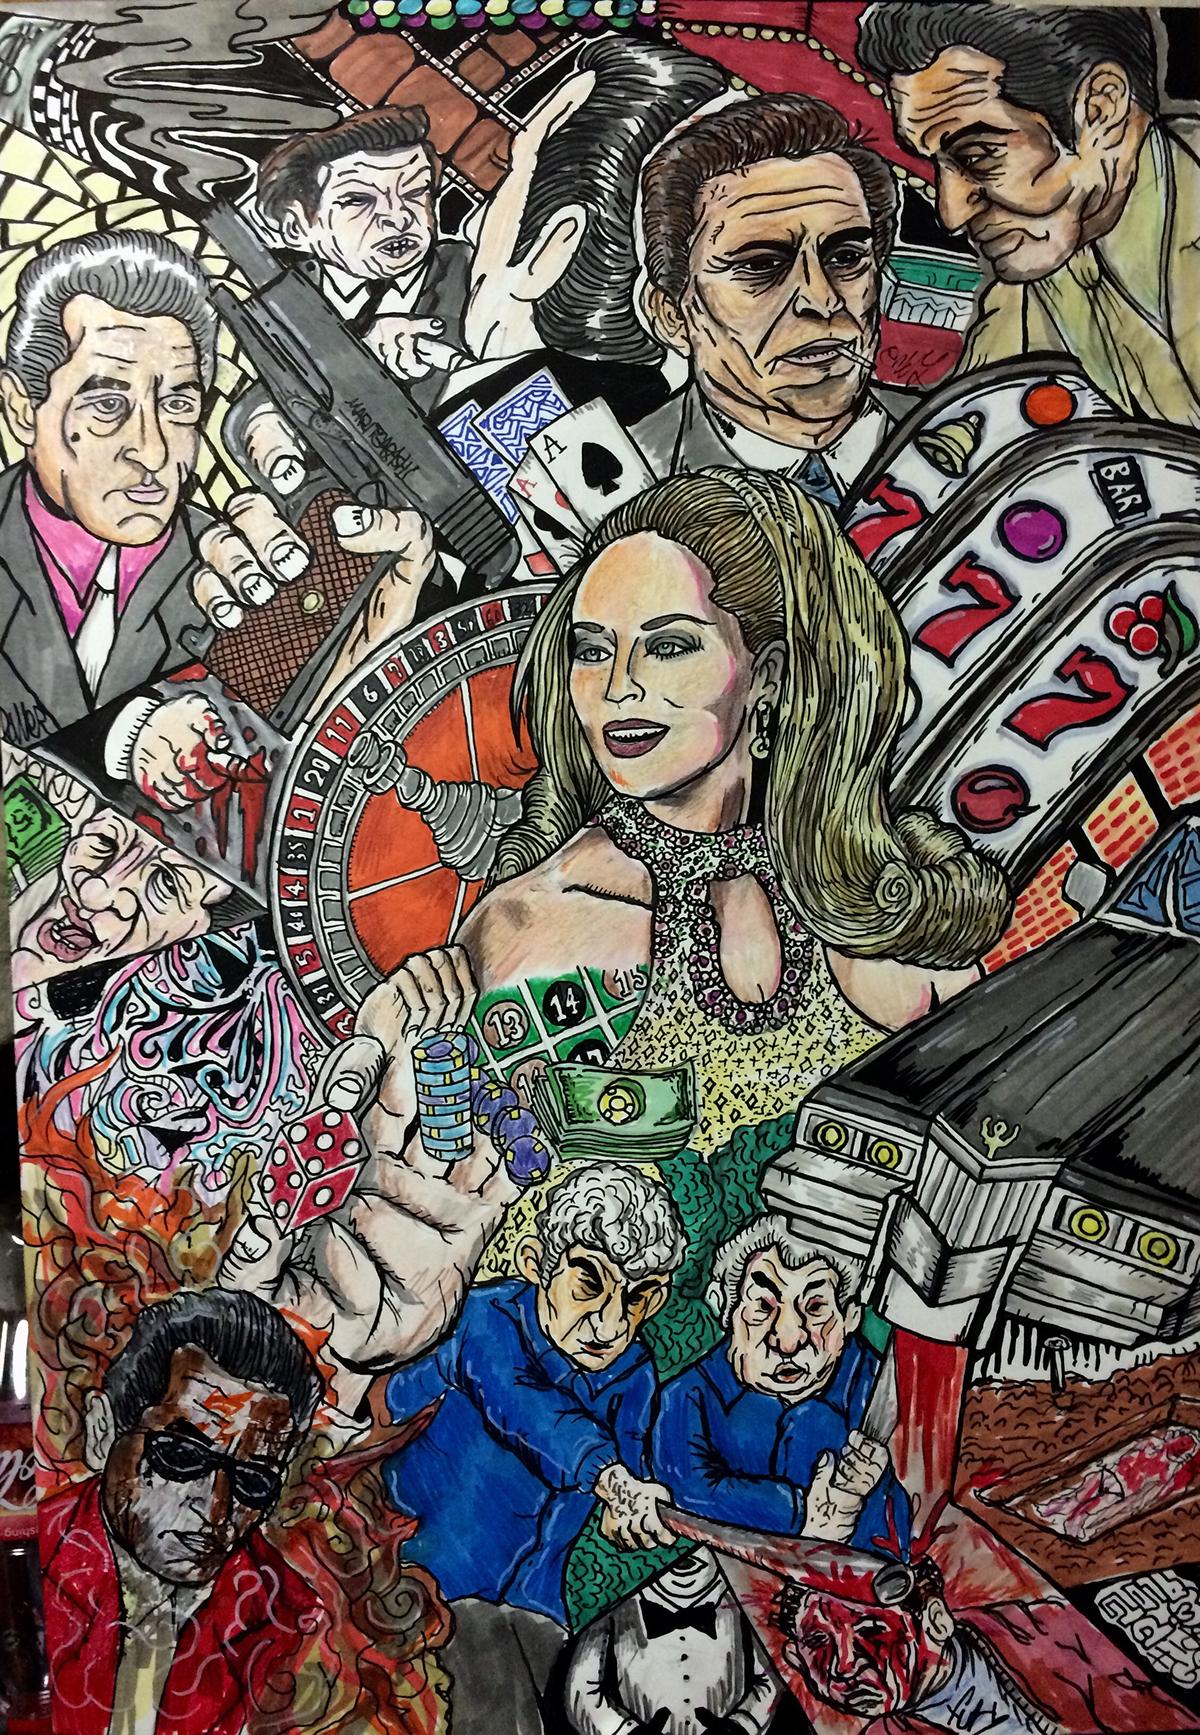 Casino movie artwork lotte busan casino